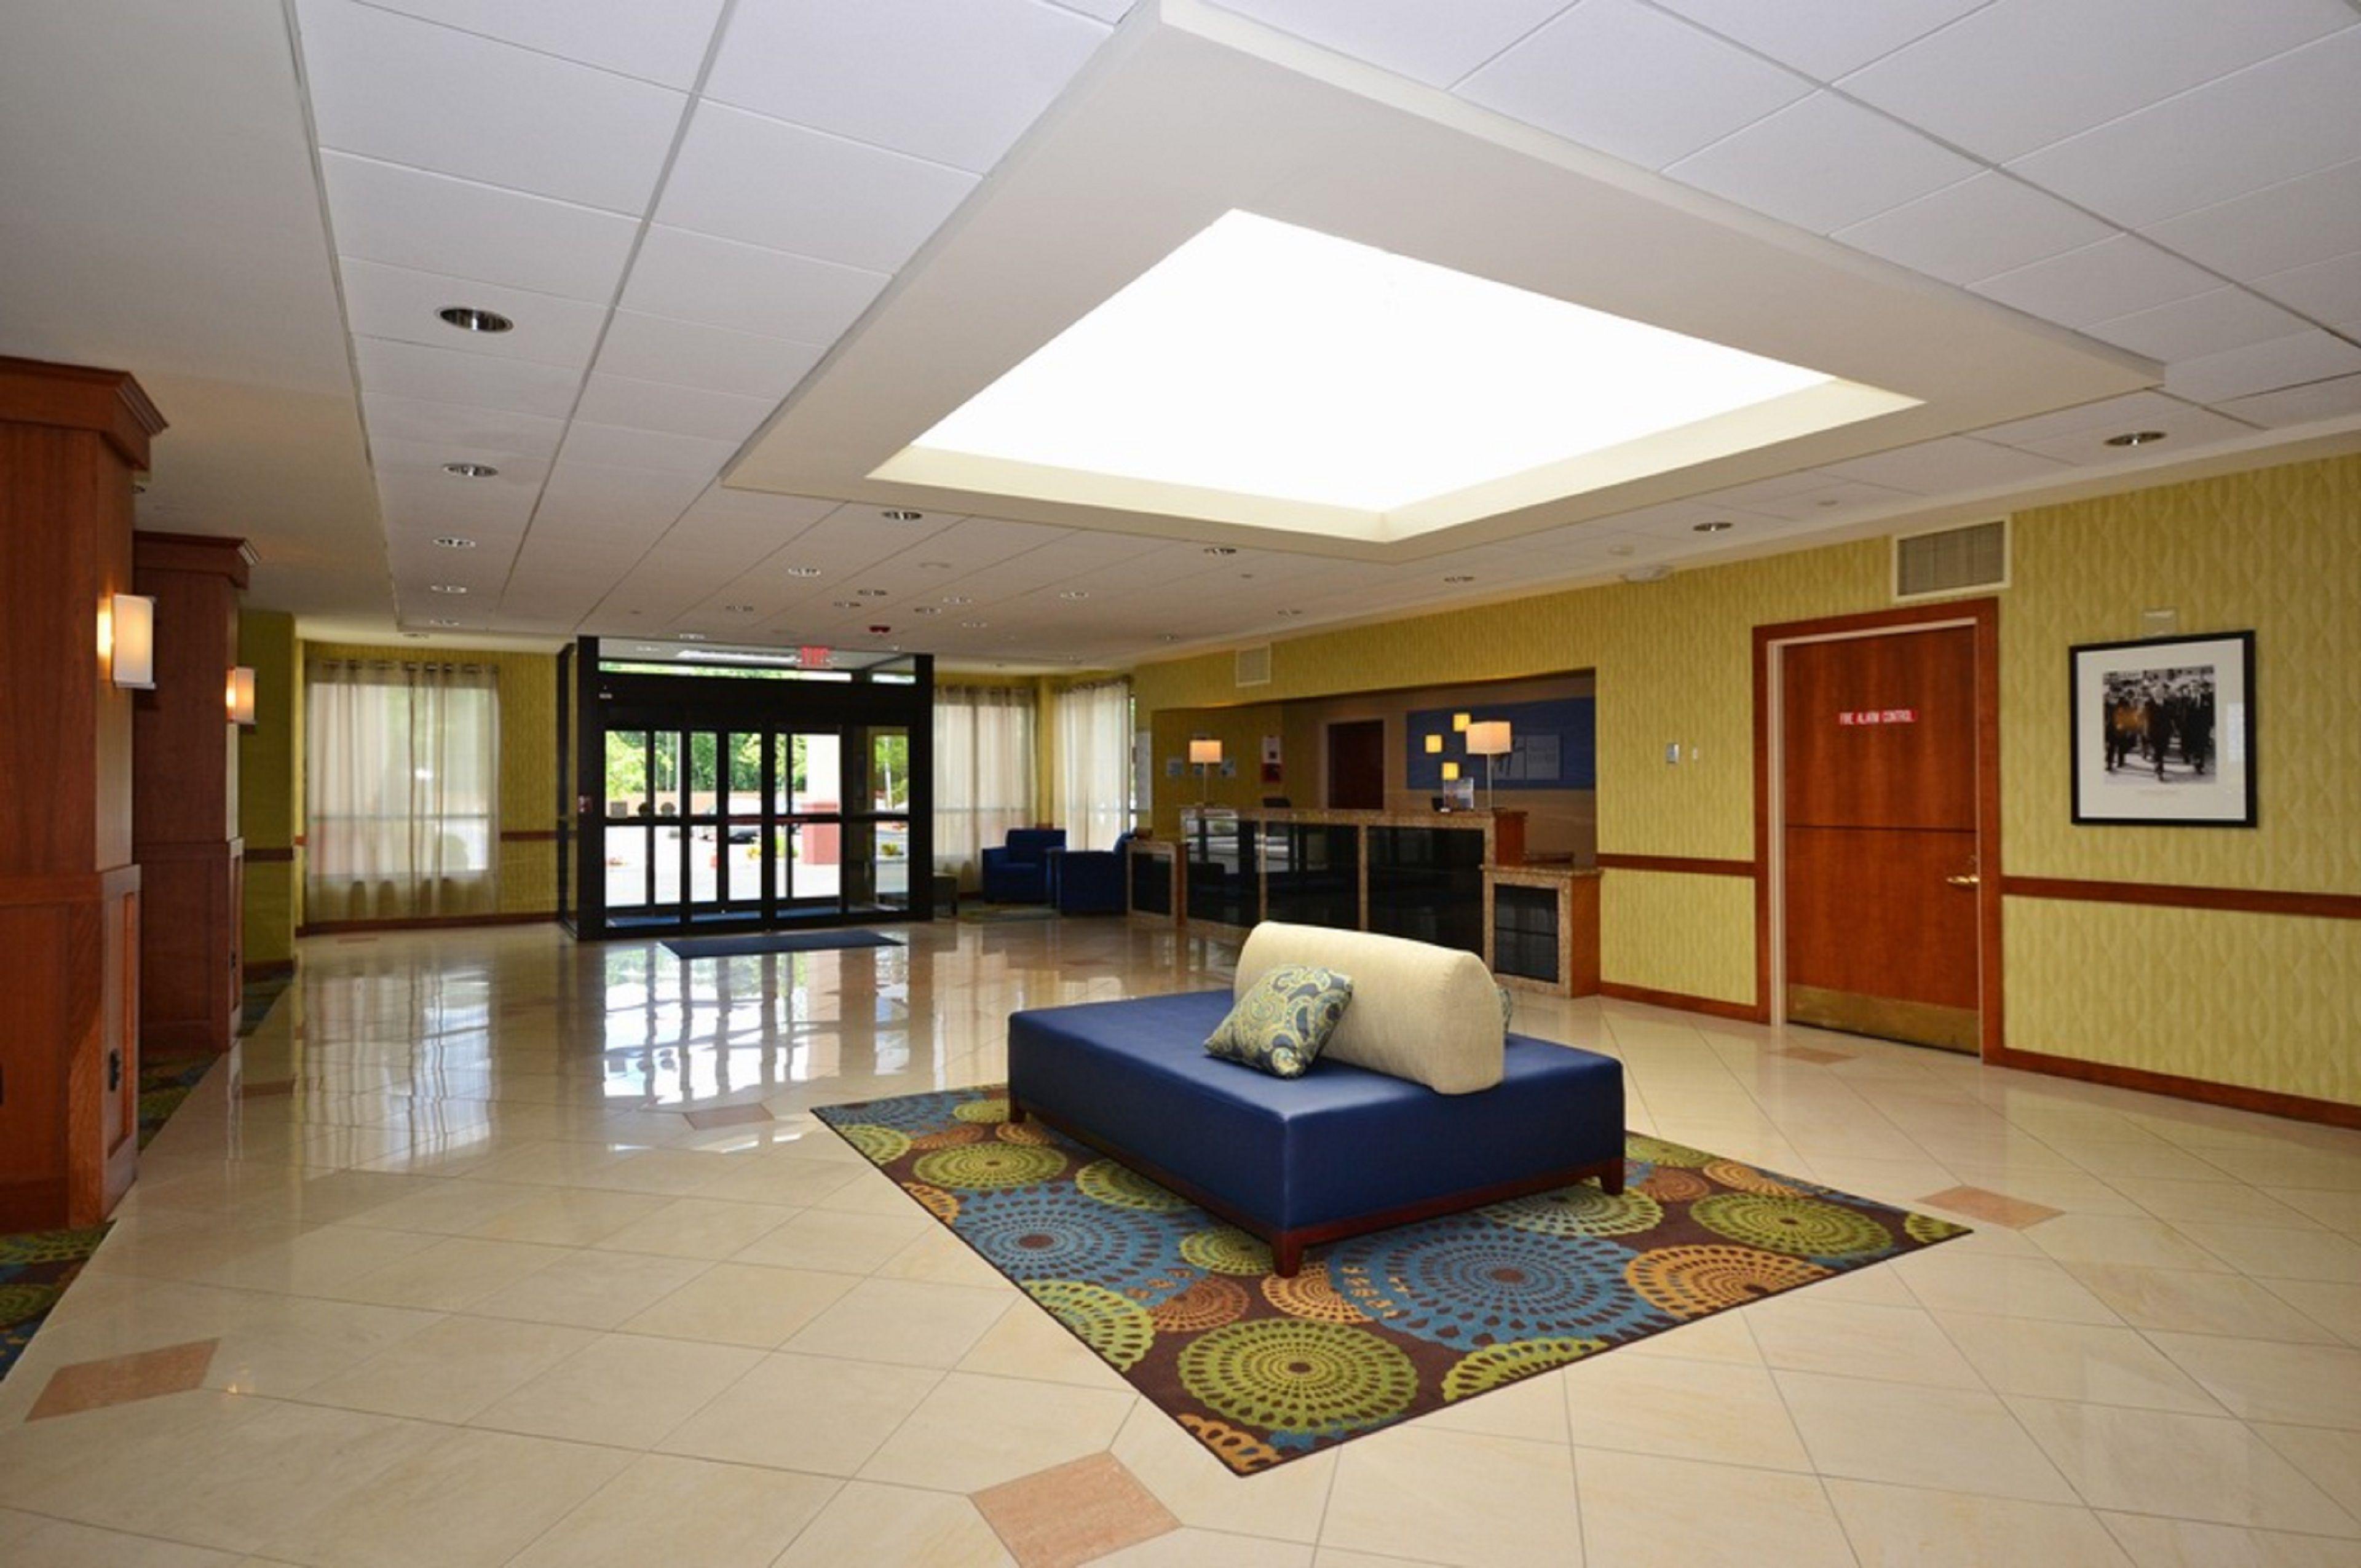 Holiday Inn Express Brockton - Boston image 4